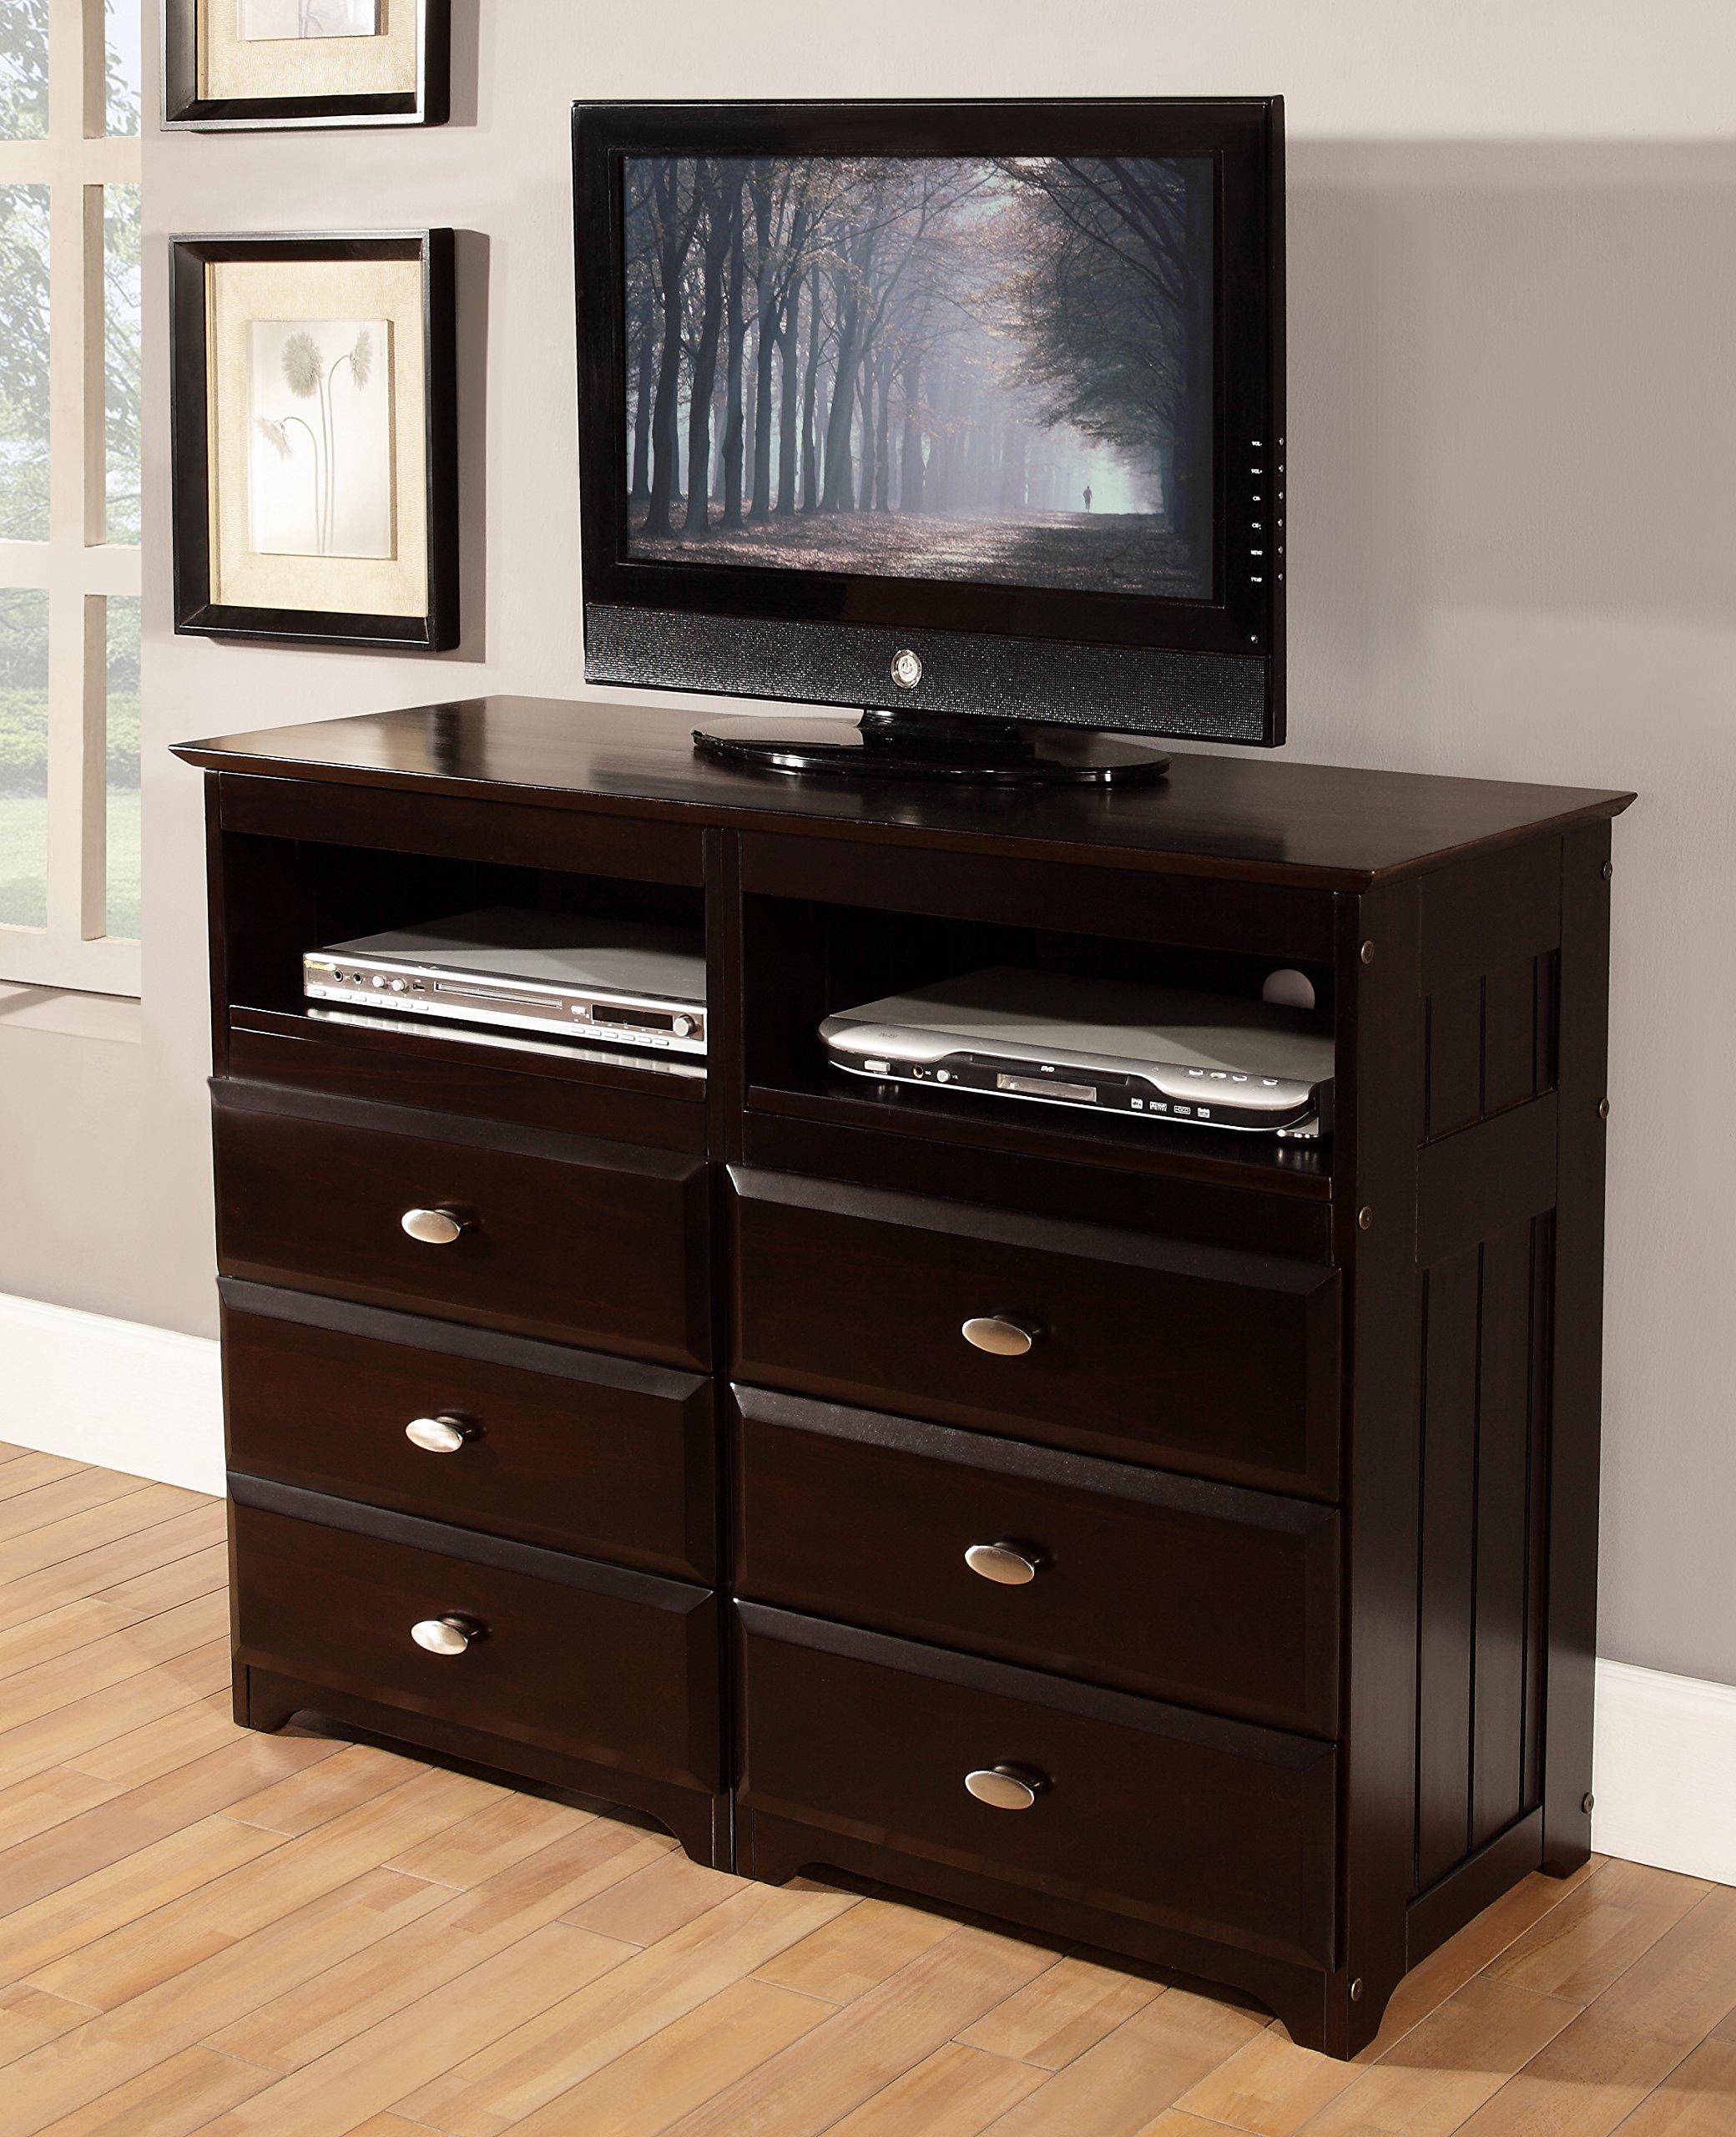 Discovery World Furniture 6 Drawer Entertainment Dresser, Espresso